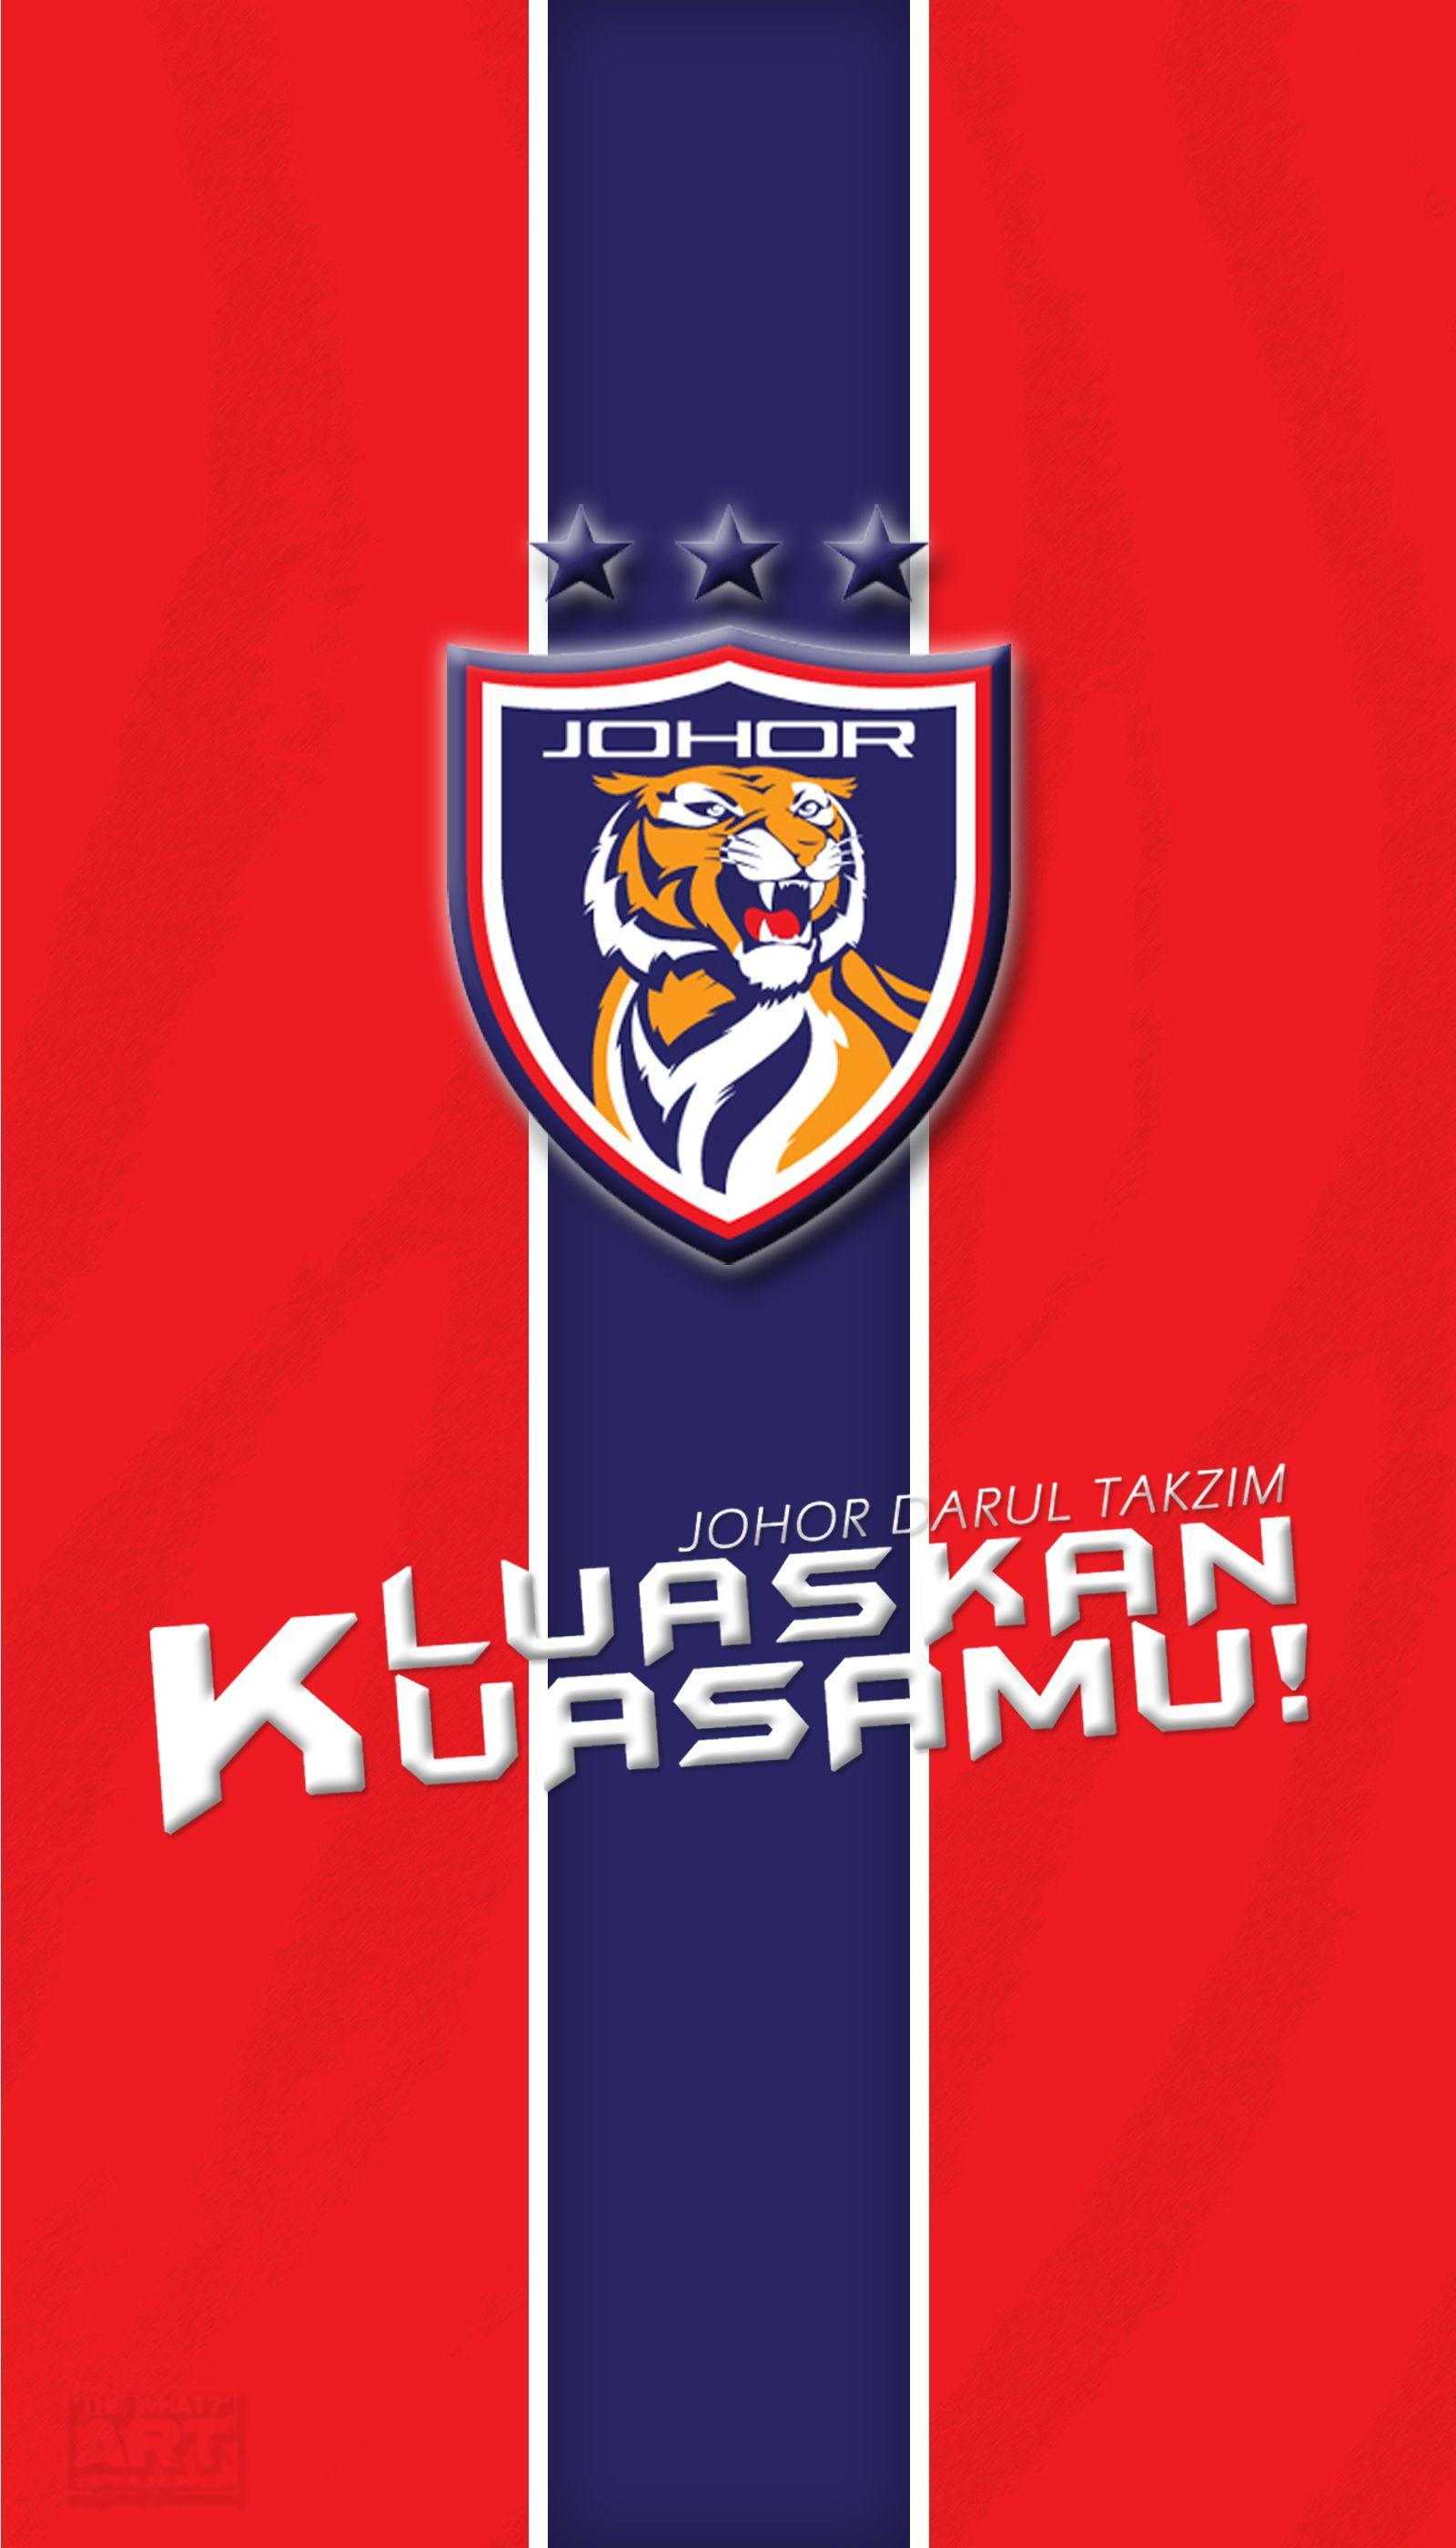 Johor Darul Takzim JDT Logo Wallpaper 20 By TheSYFFL On DeviantArt